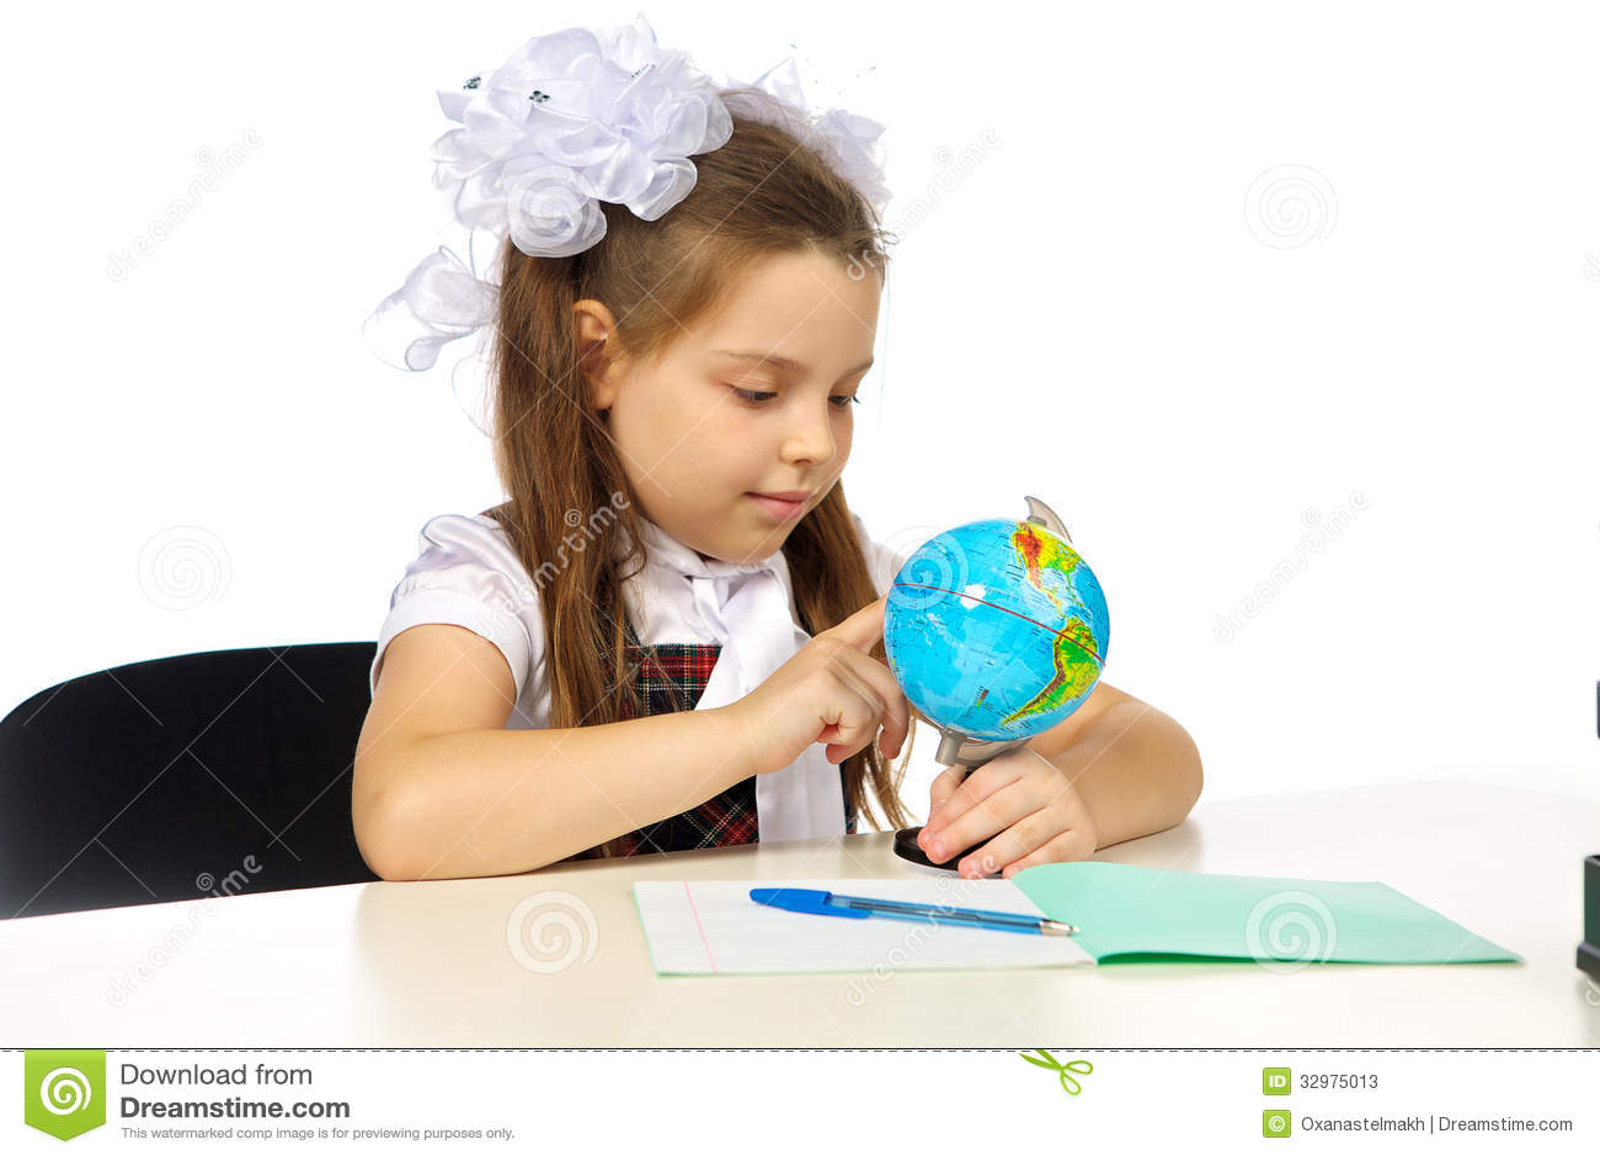 Schoolgirl Elementary School Stock Photos - Image: 32975013